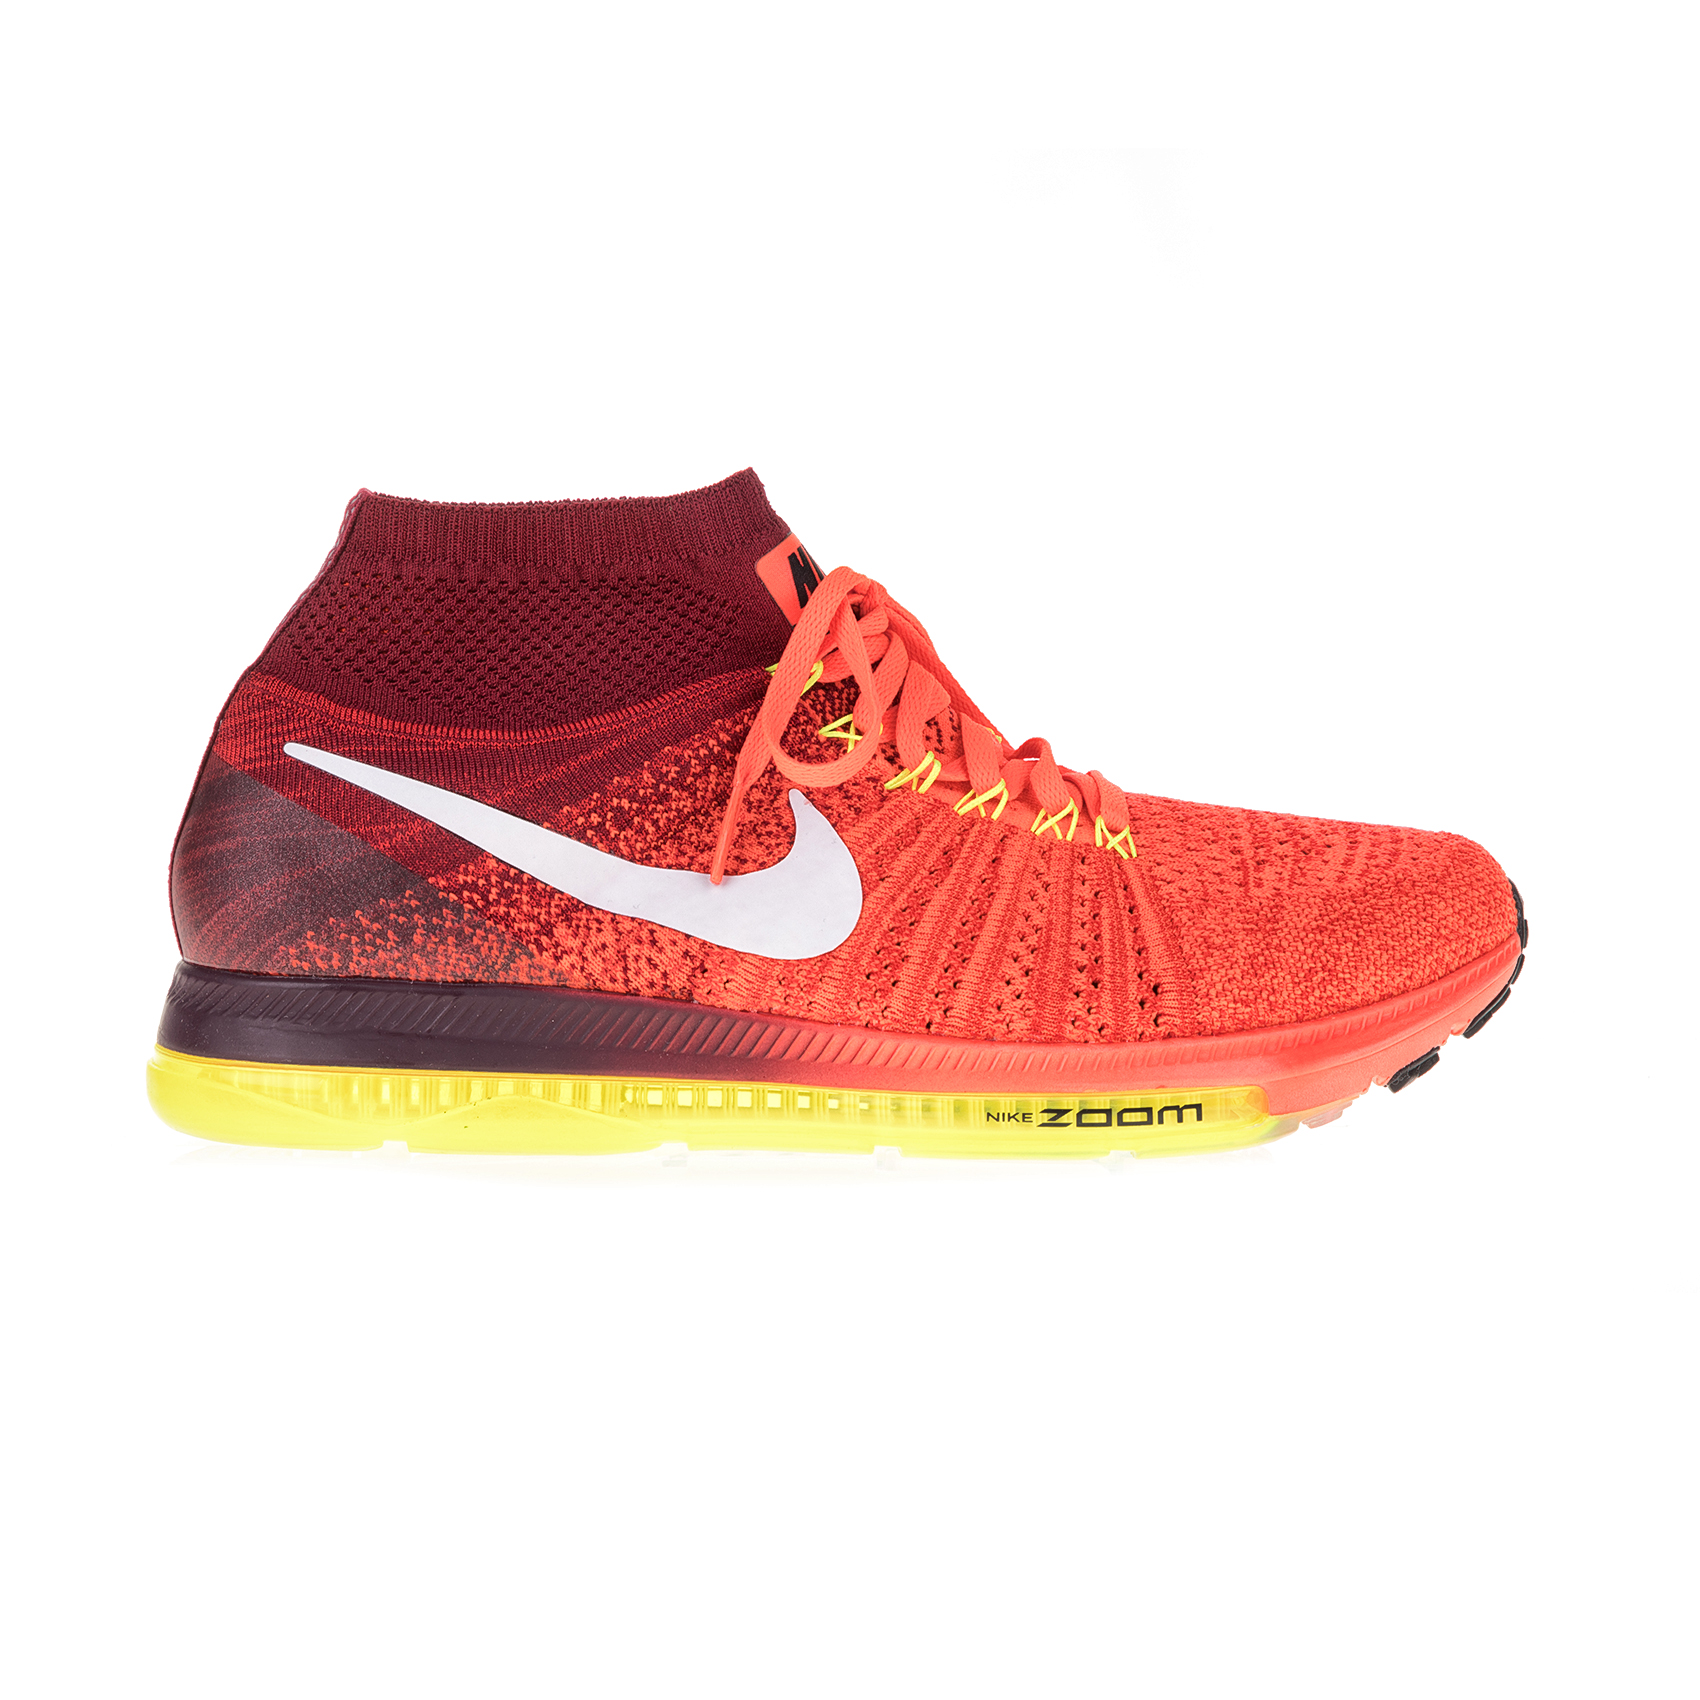 NIKE – Γυναικεία αθλητικά παπούτσια NIKE ZOOM ALL OUT FLYKNIT πορτοκαλί-κόκκινα